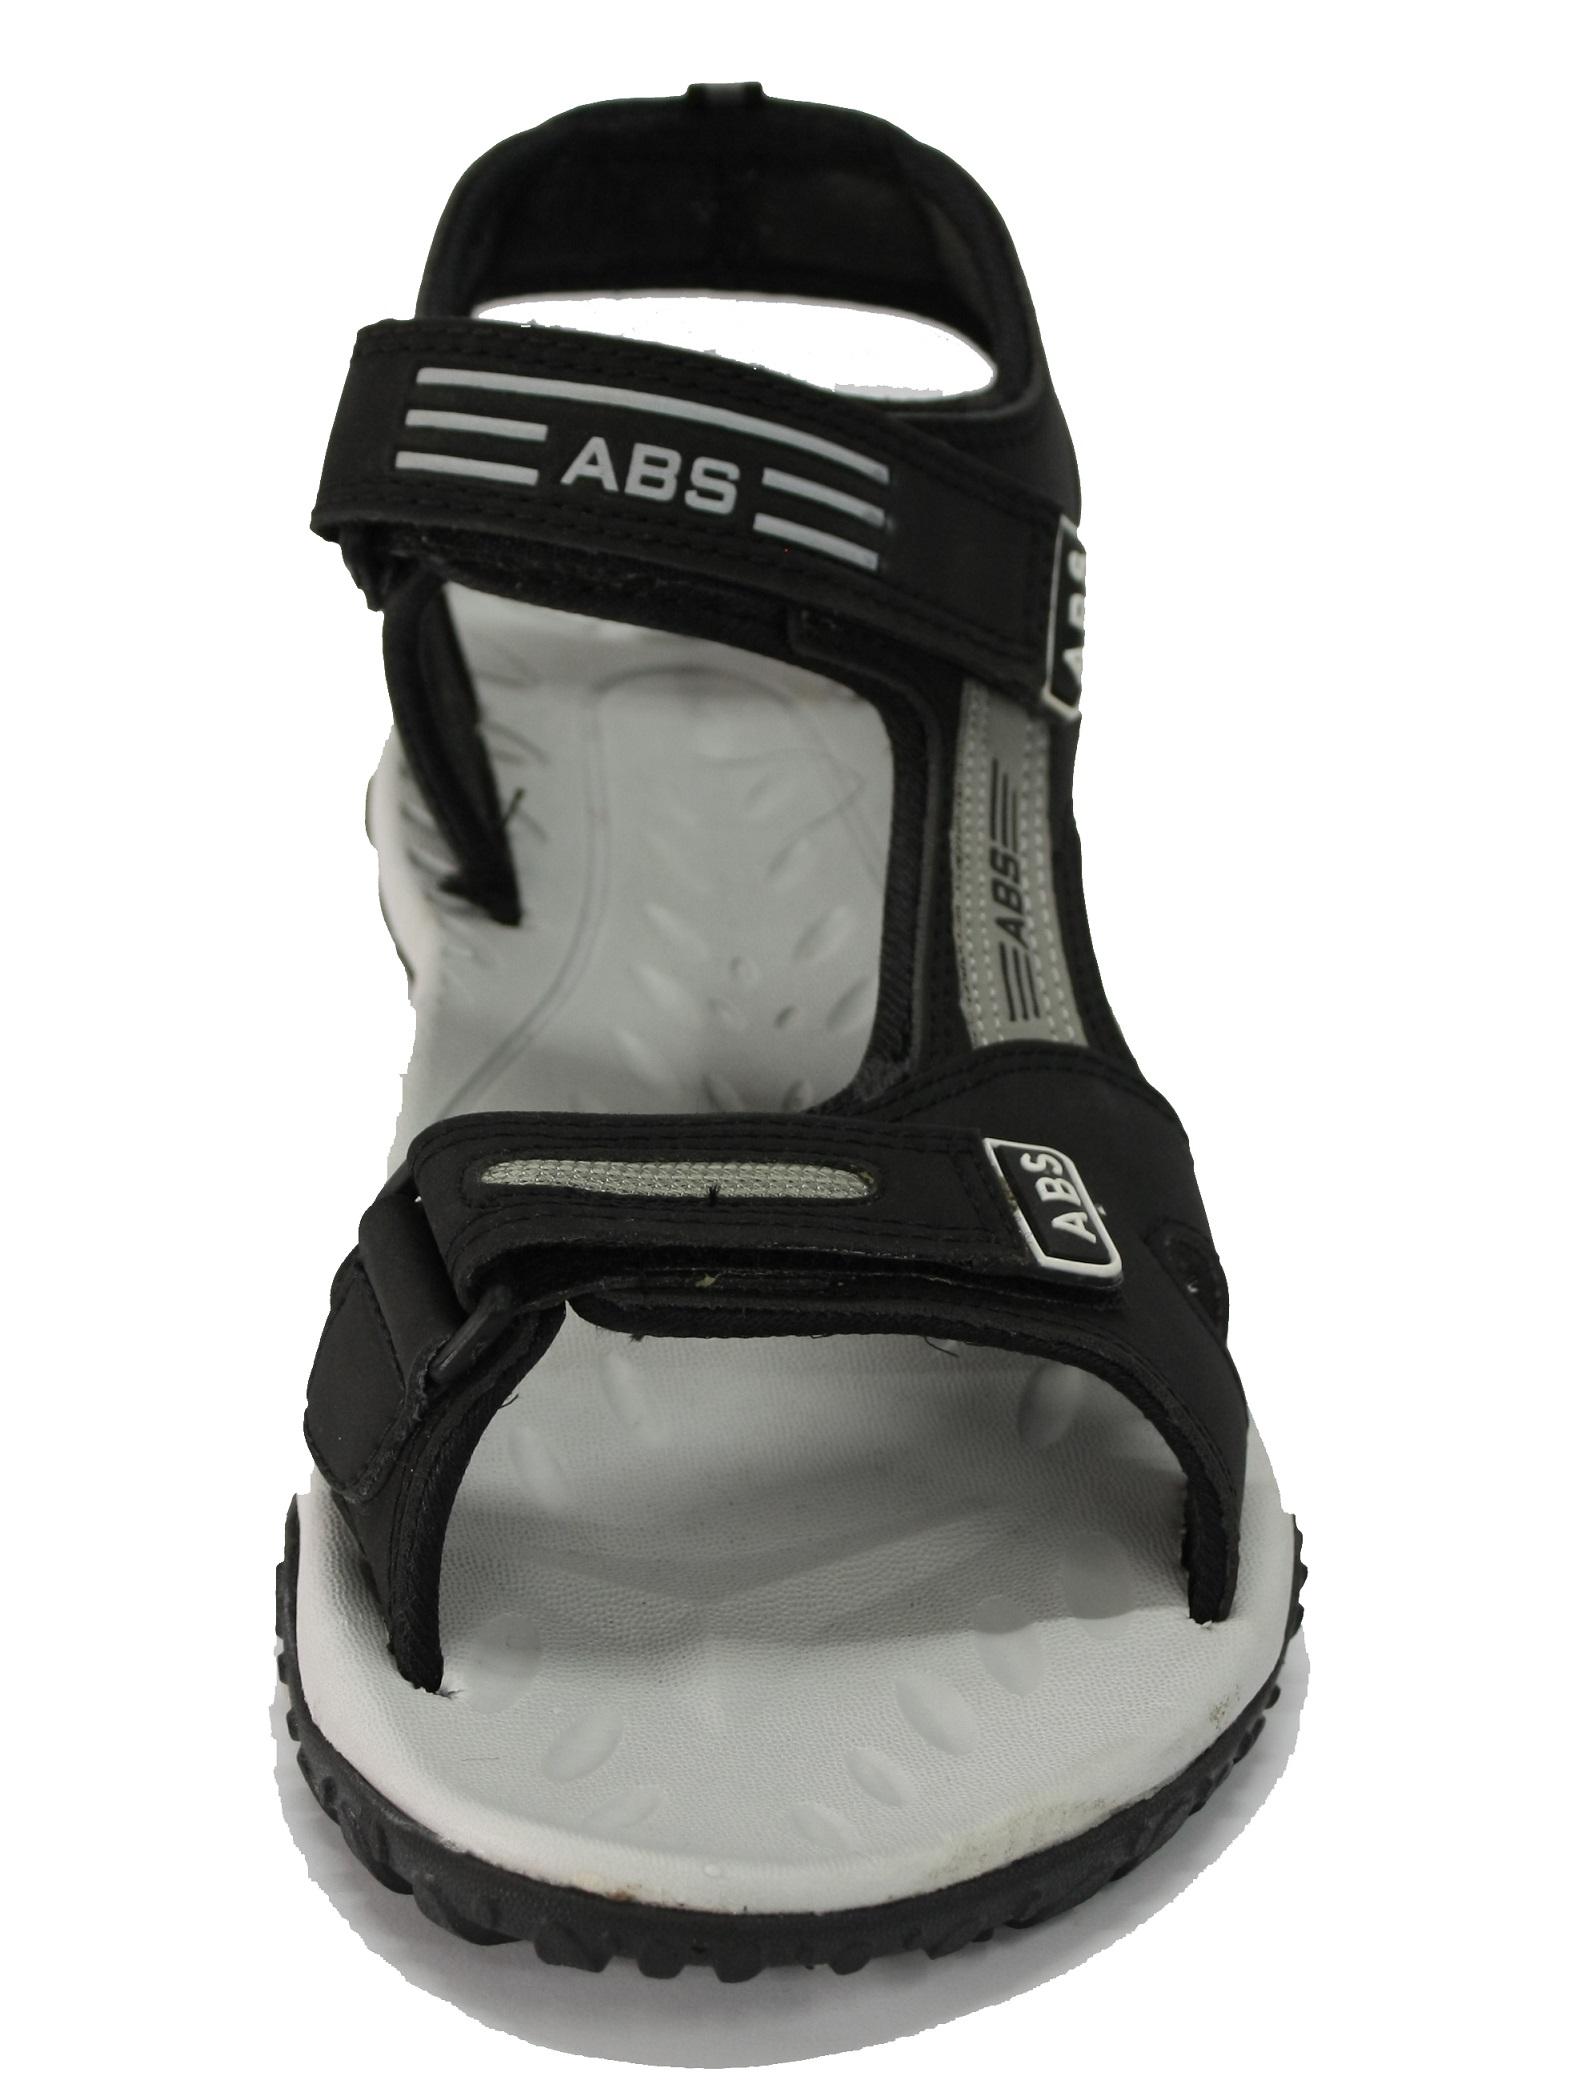 ABS Men's Grey & Black Classy Sandals